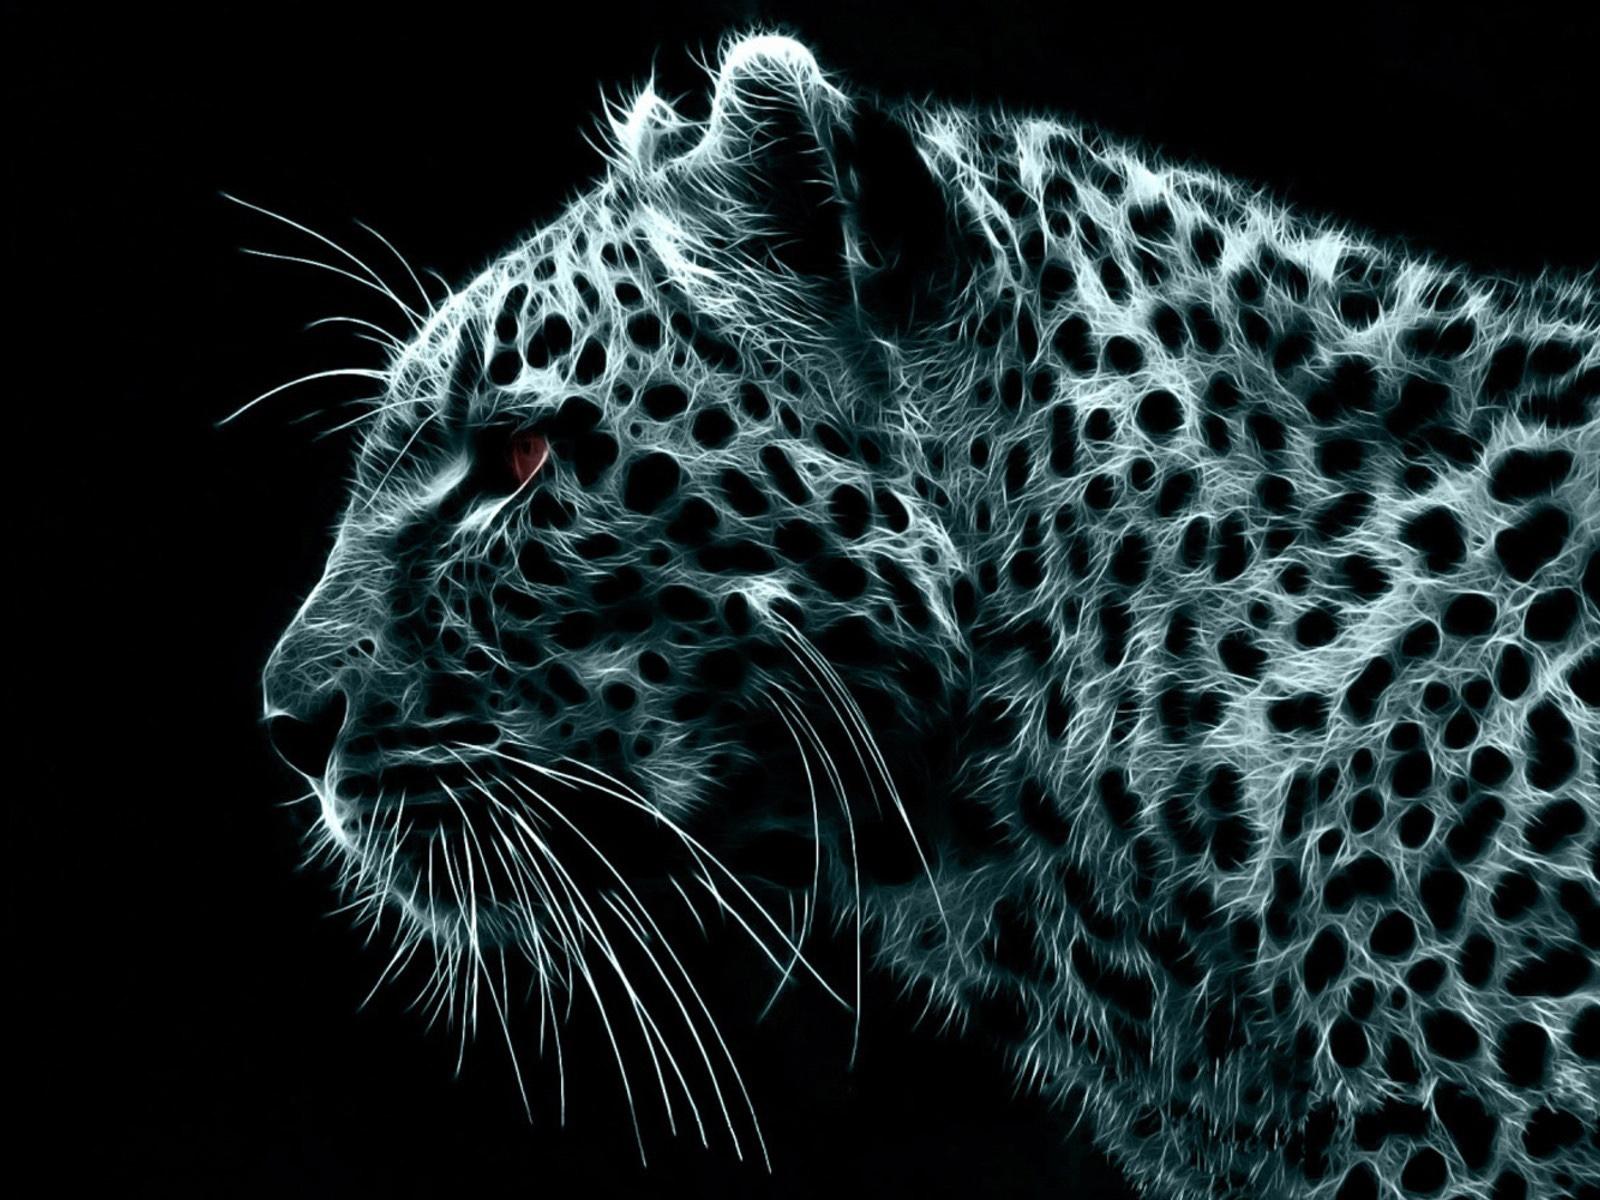 HD Wallpaper of Crazy Leopard Wallpapers Hd, Desktop Wallpaper Crazy Leopard Wallpapers Hd